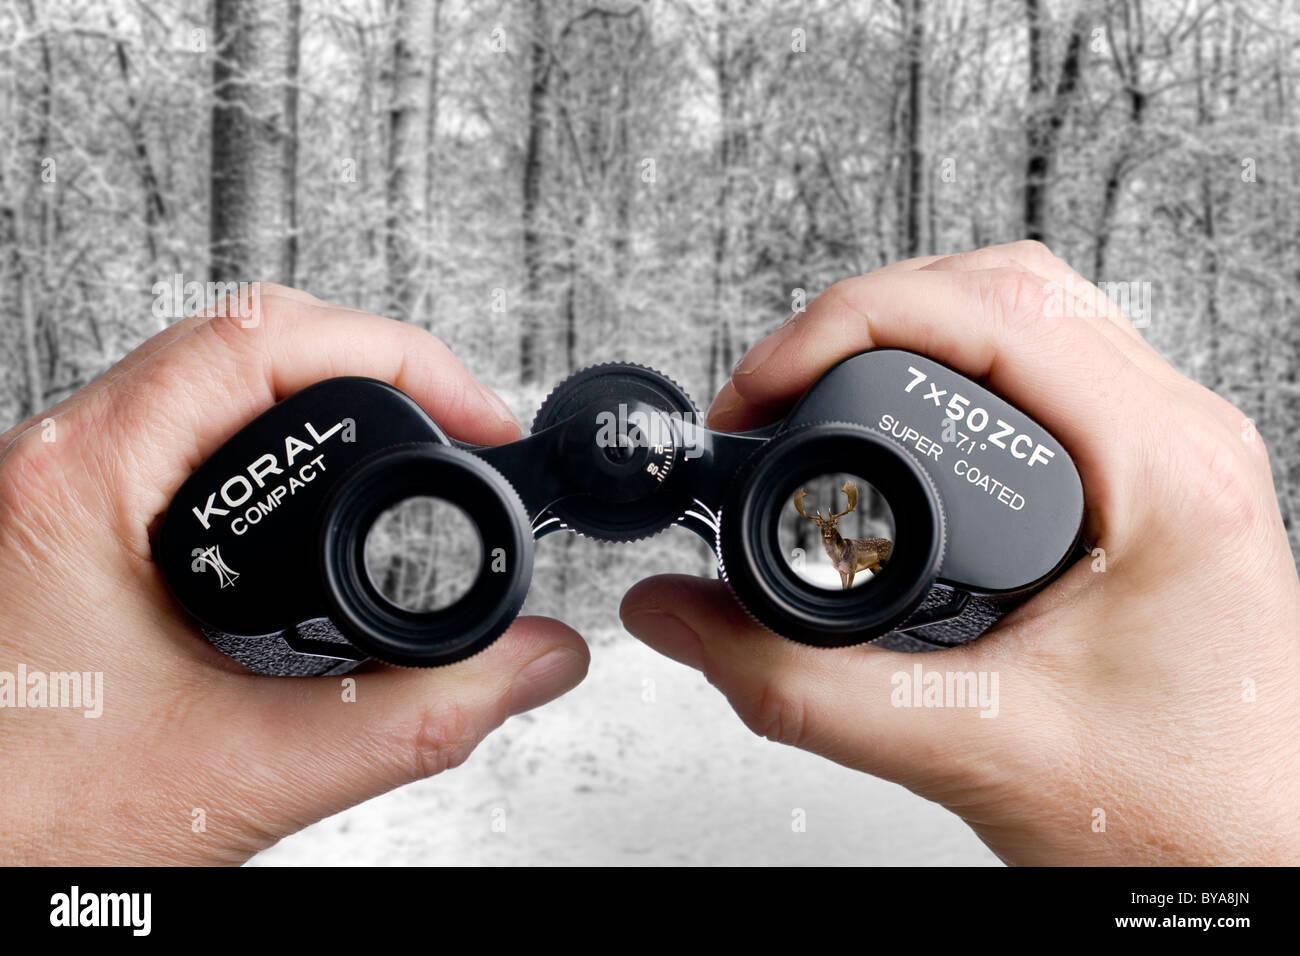 Looking through binoculars toward a deer in the forest - Stock Image